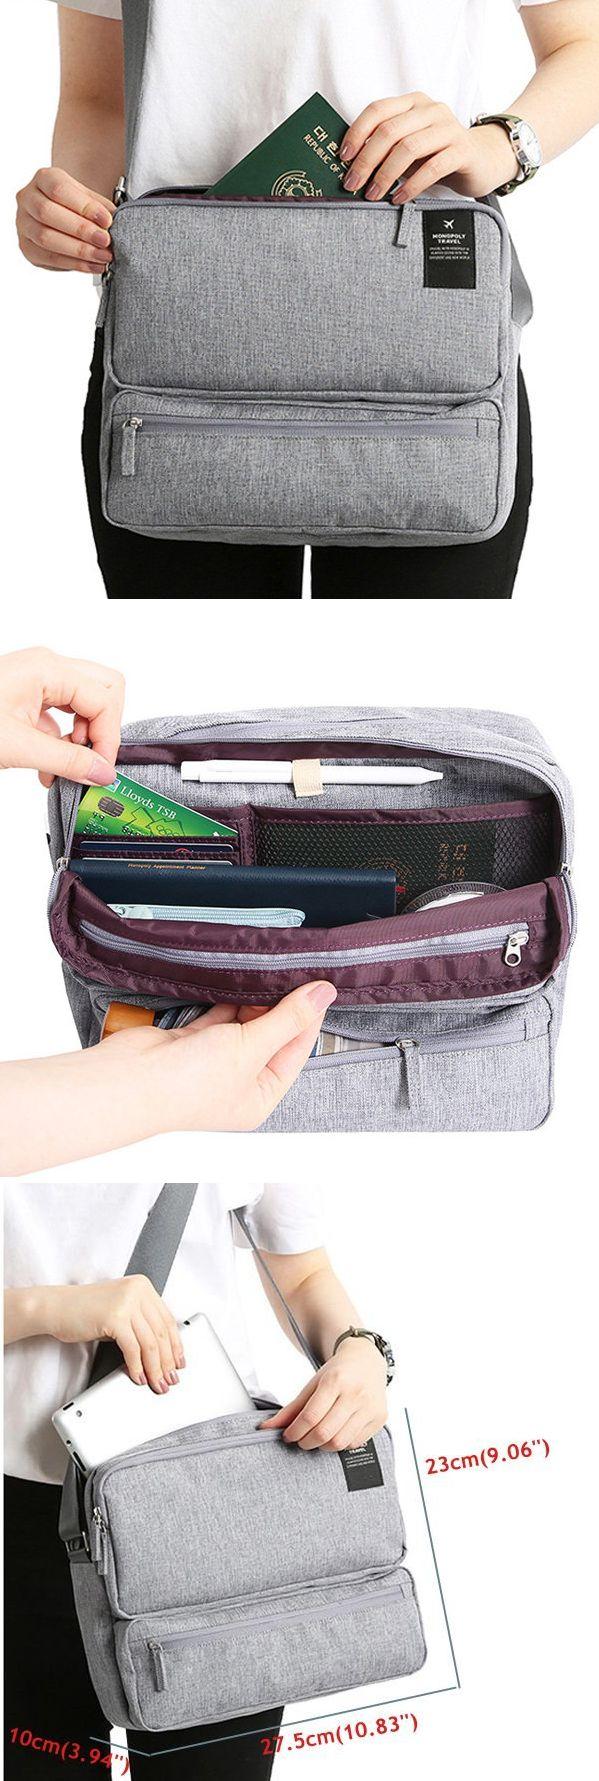 US$16.89 Women Men Unisex Outdoor Large Capacity Functional Laptop Shoulder Bag Crossbody Bag